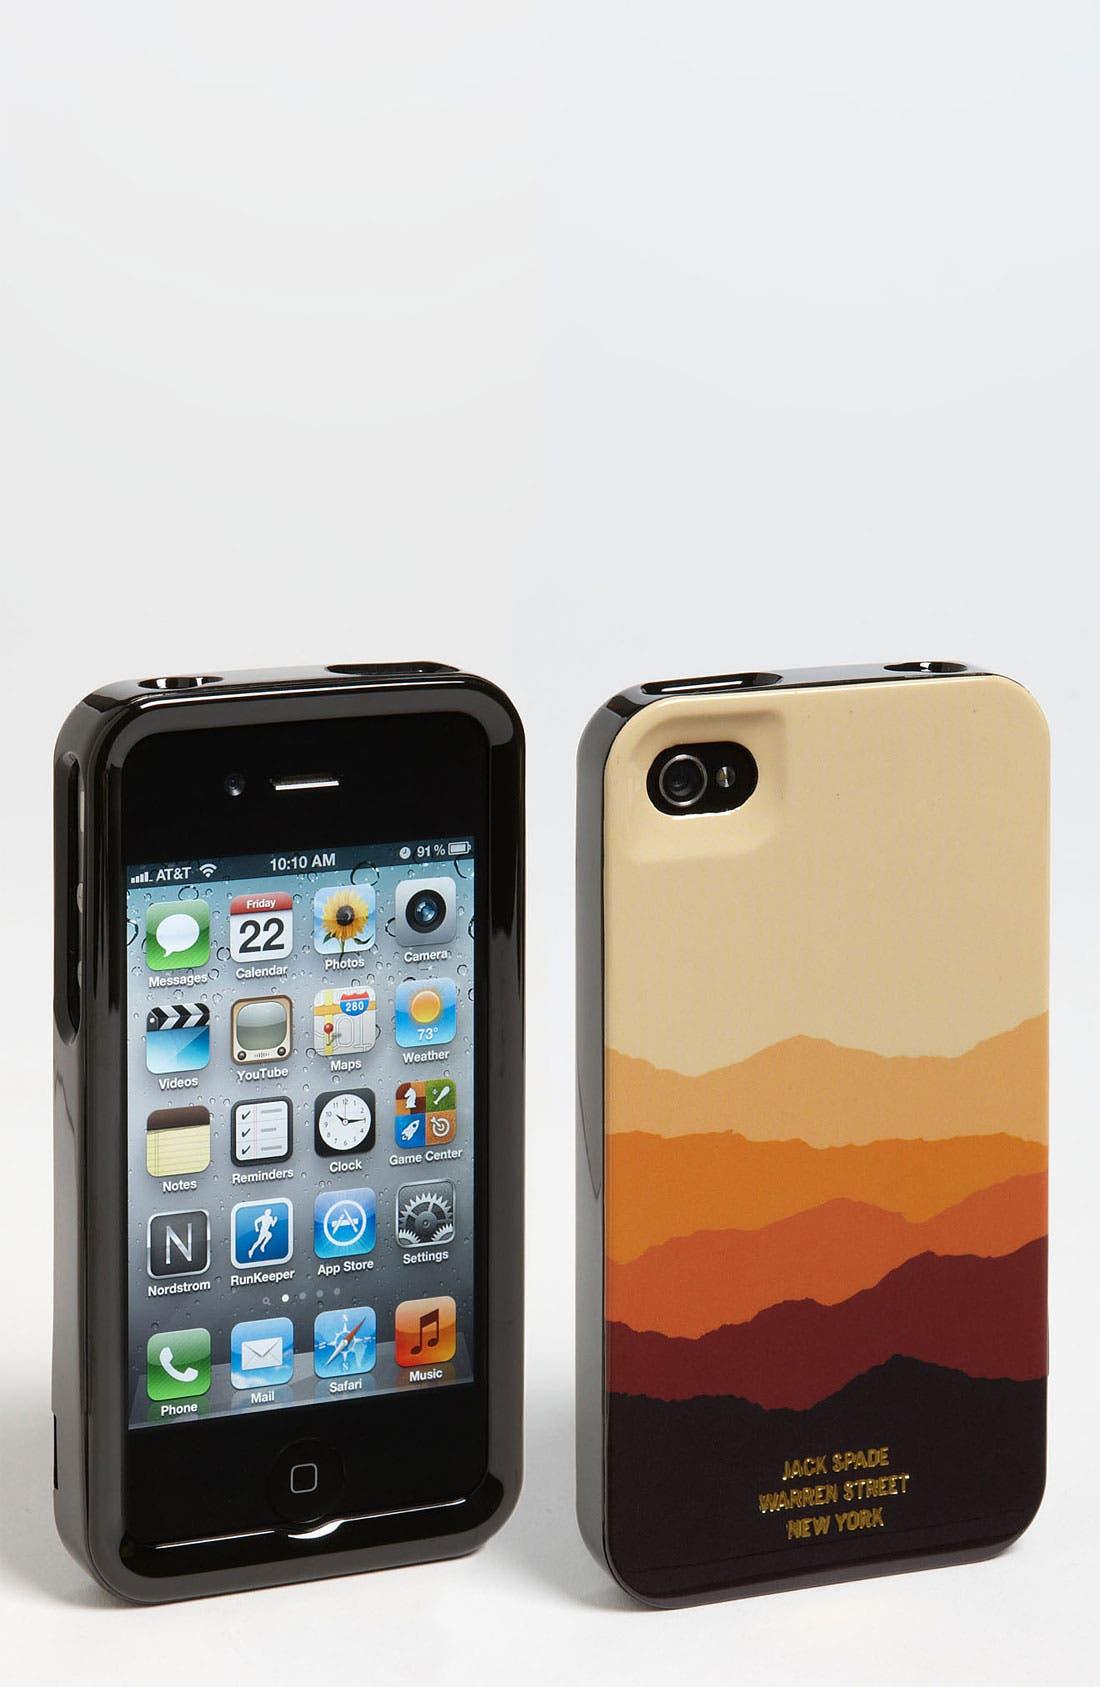 Alternate Image 1 Selected - Jack Spade 'Mountain' iPhone 4 & 4S Case